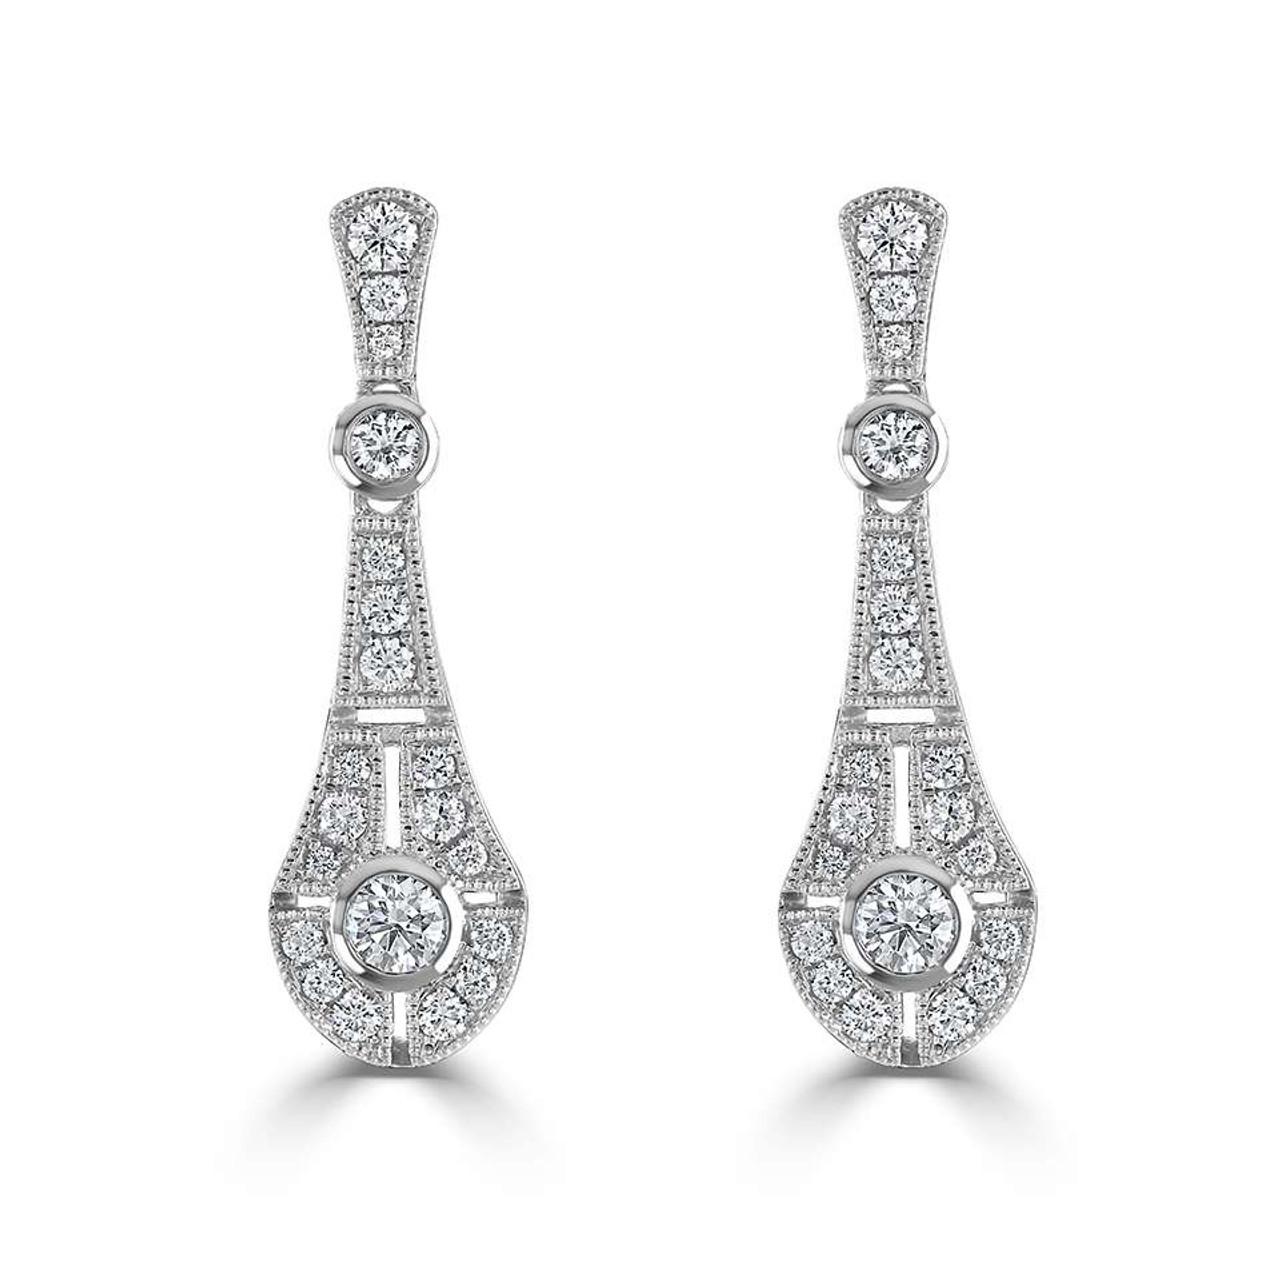 18ct White Gold Diamond Heirloom Drop Earrings